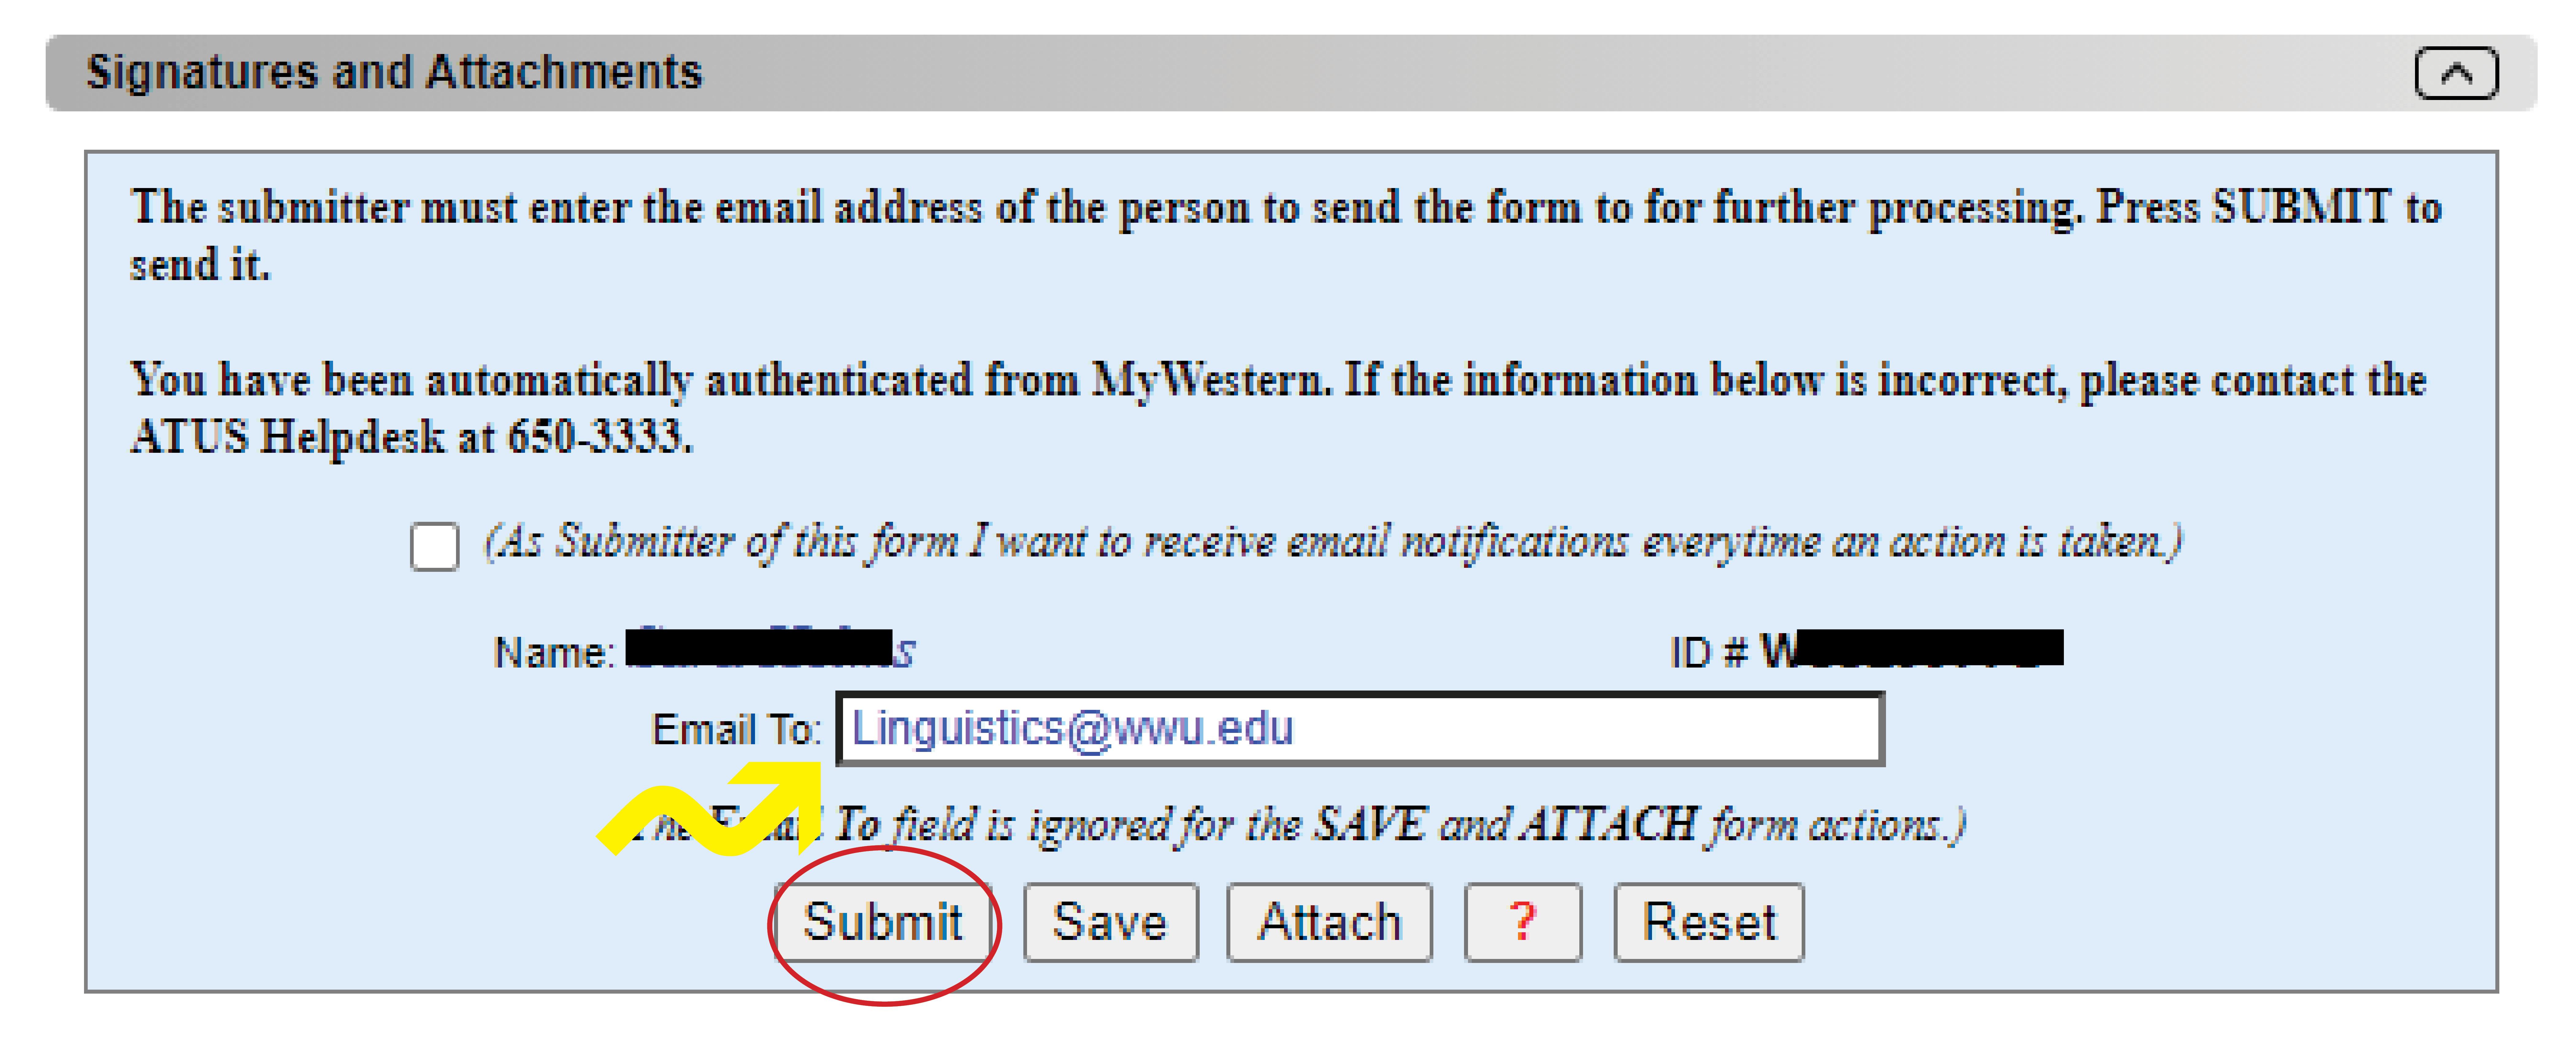 Screenshot of webform with email field set to linguistics@wwu.edu